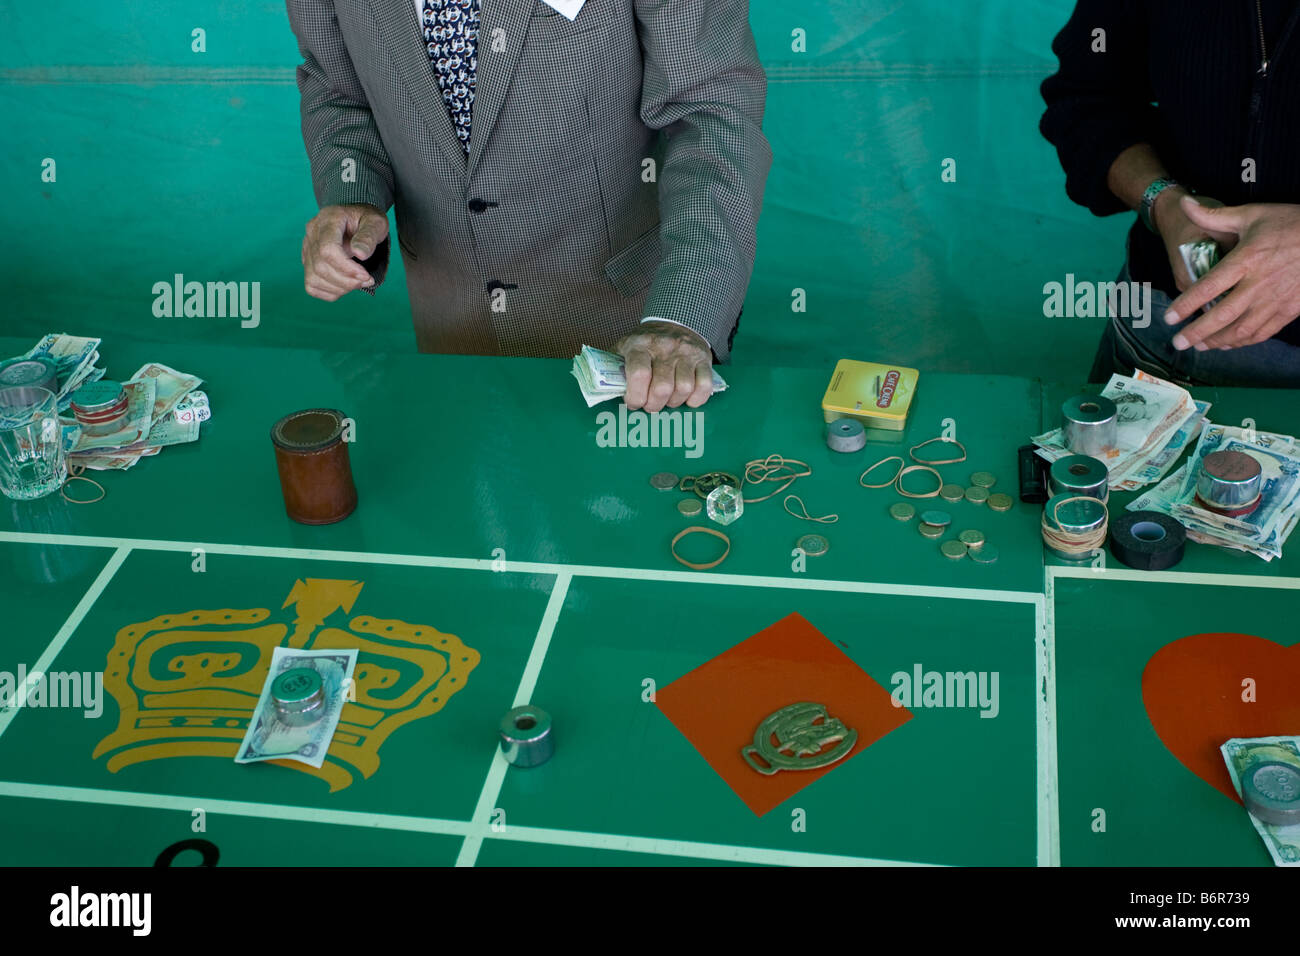 el dorado hotel and casino in shreveport